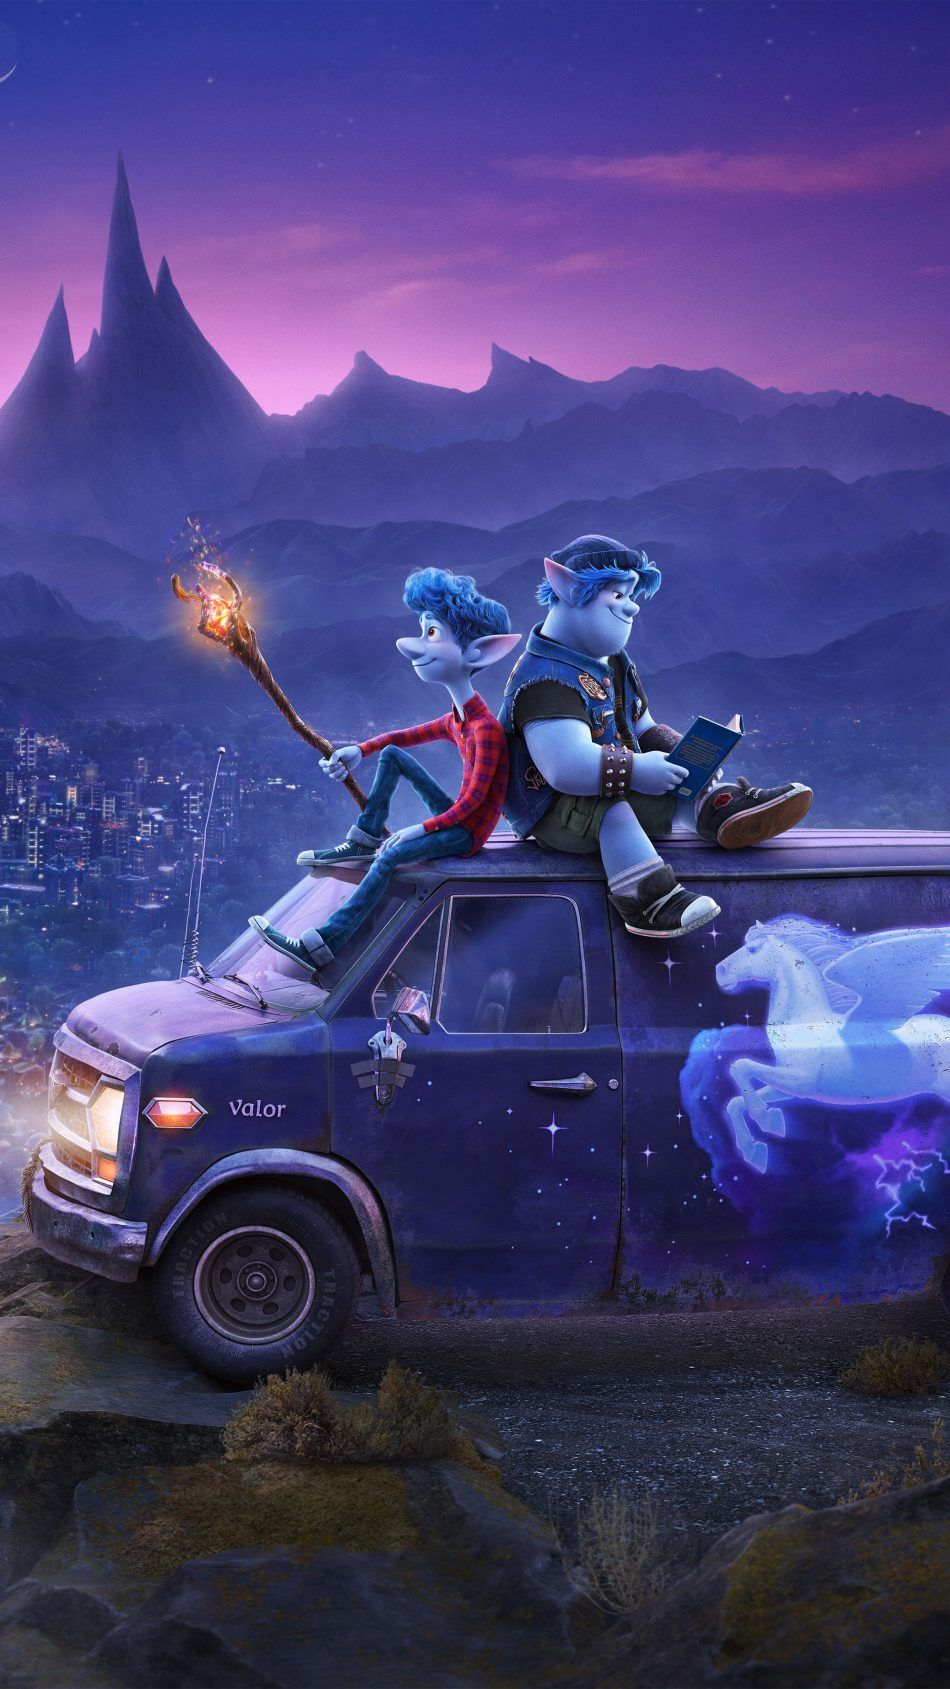 Onward Animation 2020 Disney pixar movies Disney art Animation 950x1689